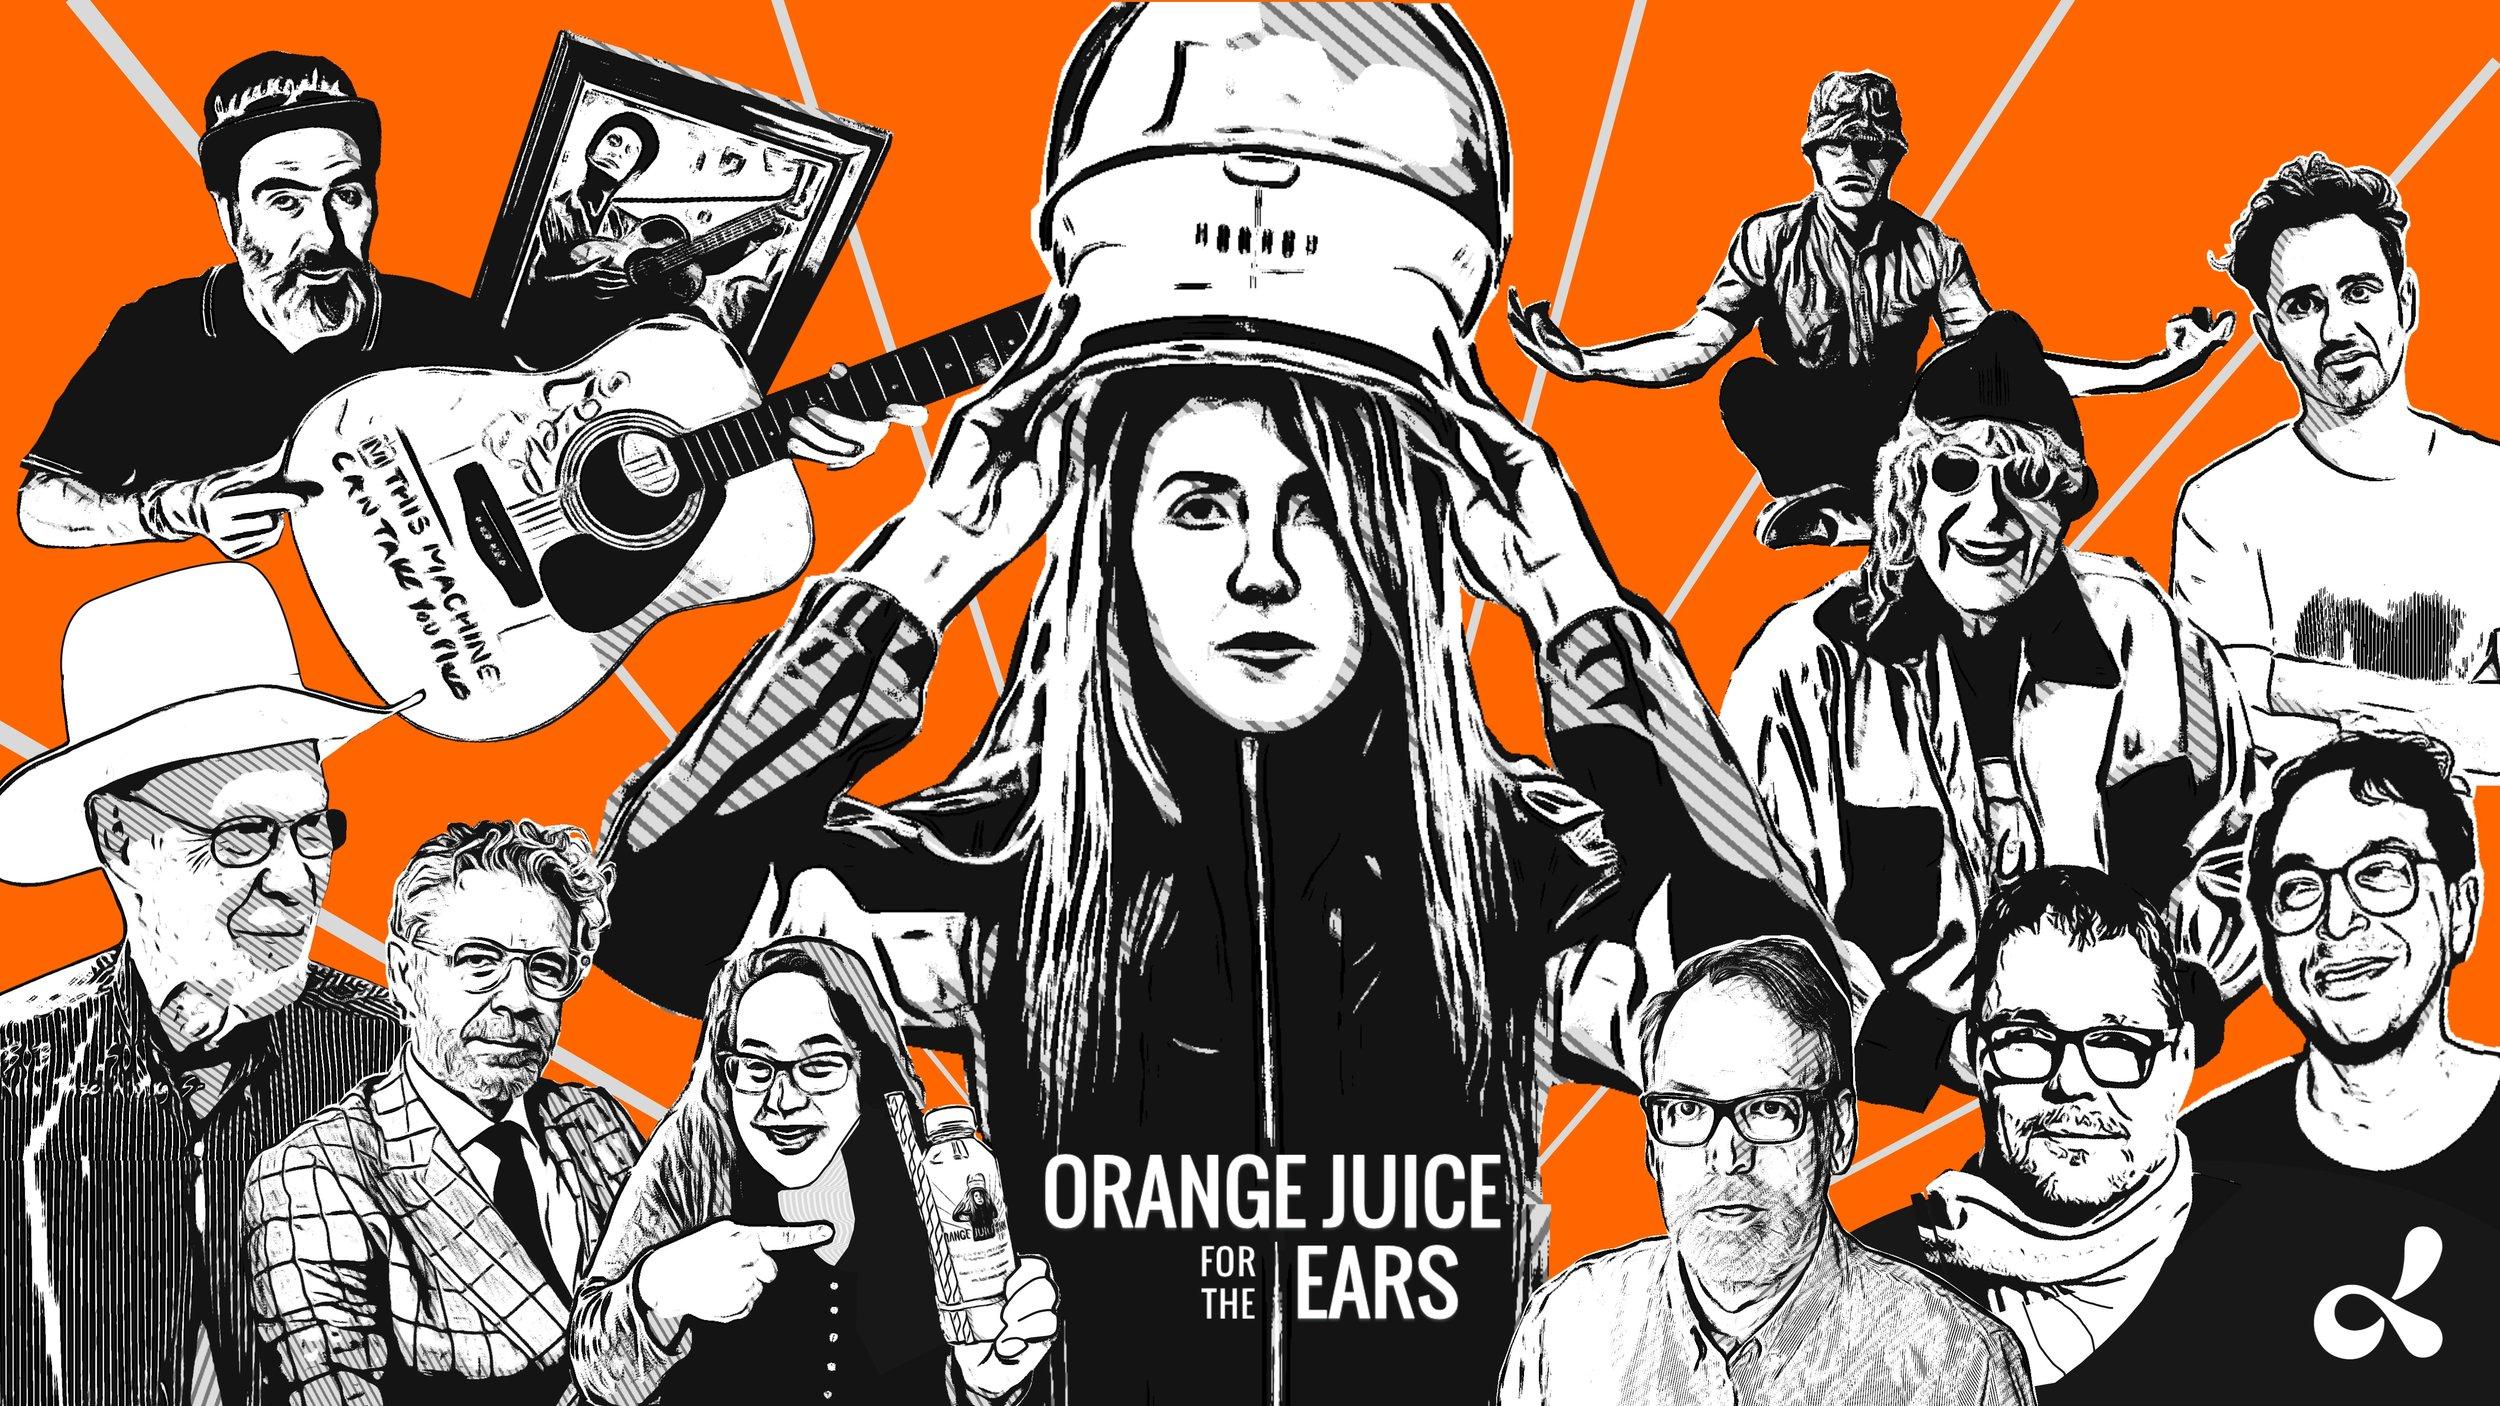 dublab radio - oj for ears - 16by9 artwork v5.jpg